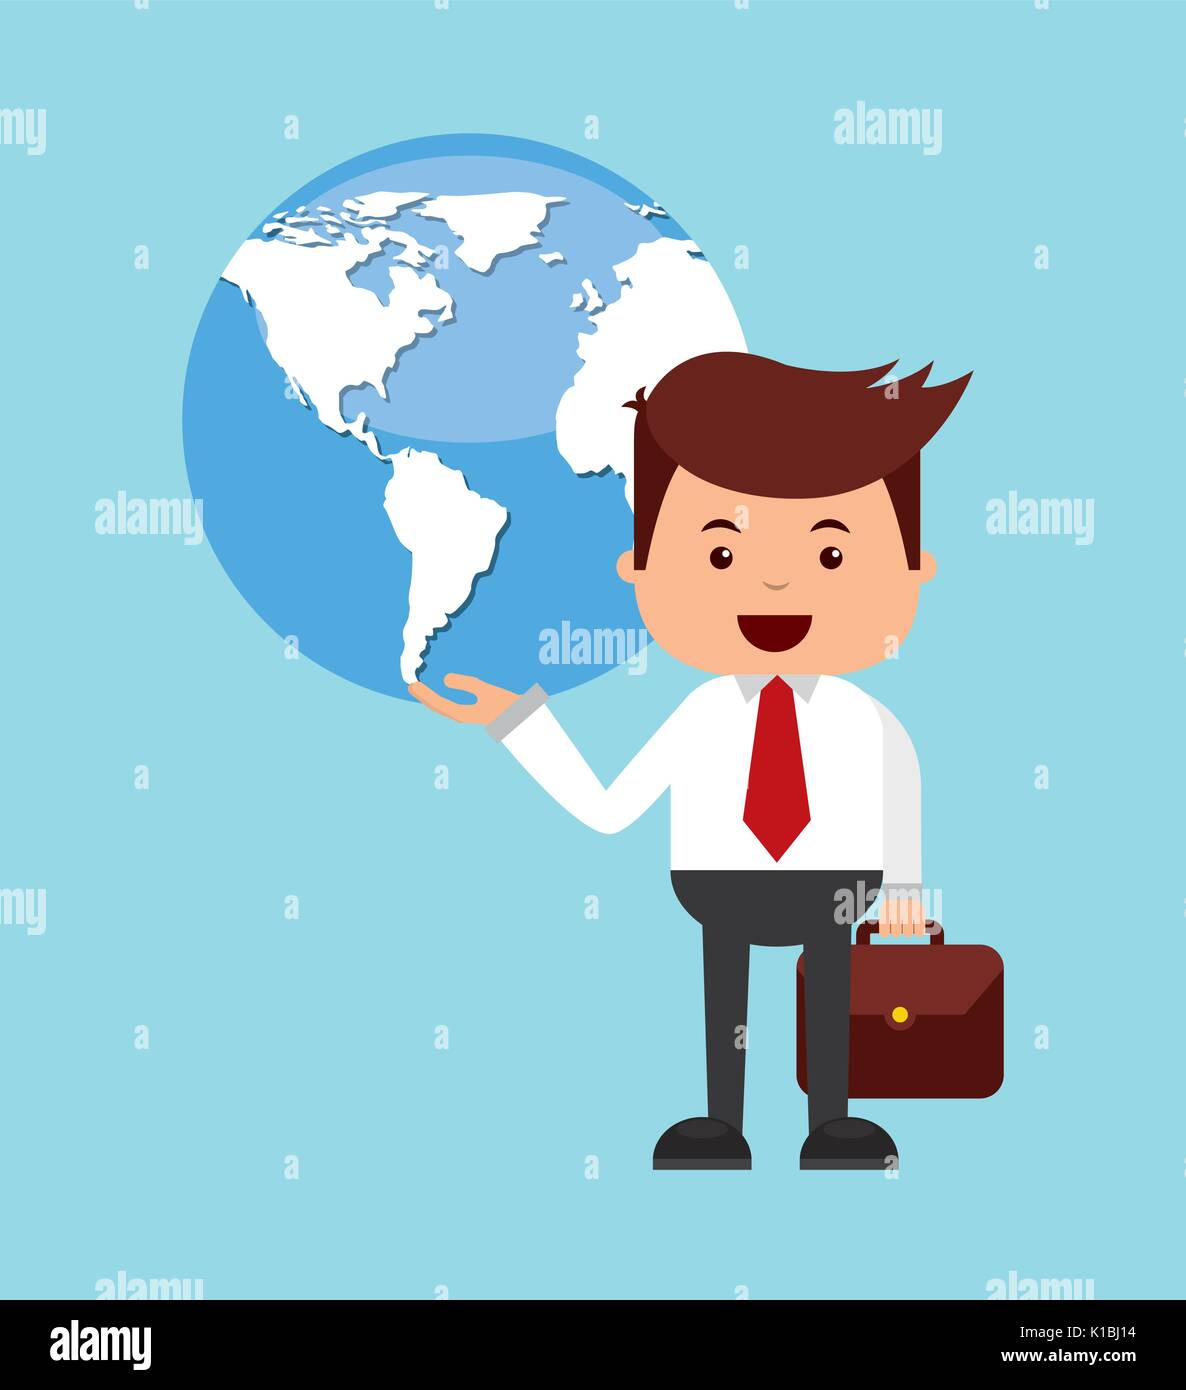 global economy design  - Stock Image